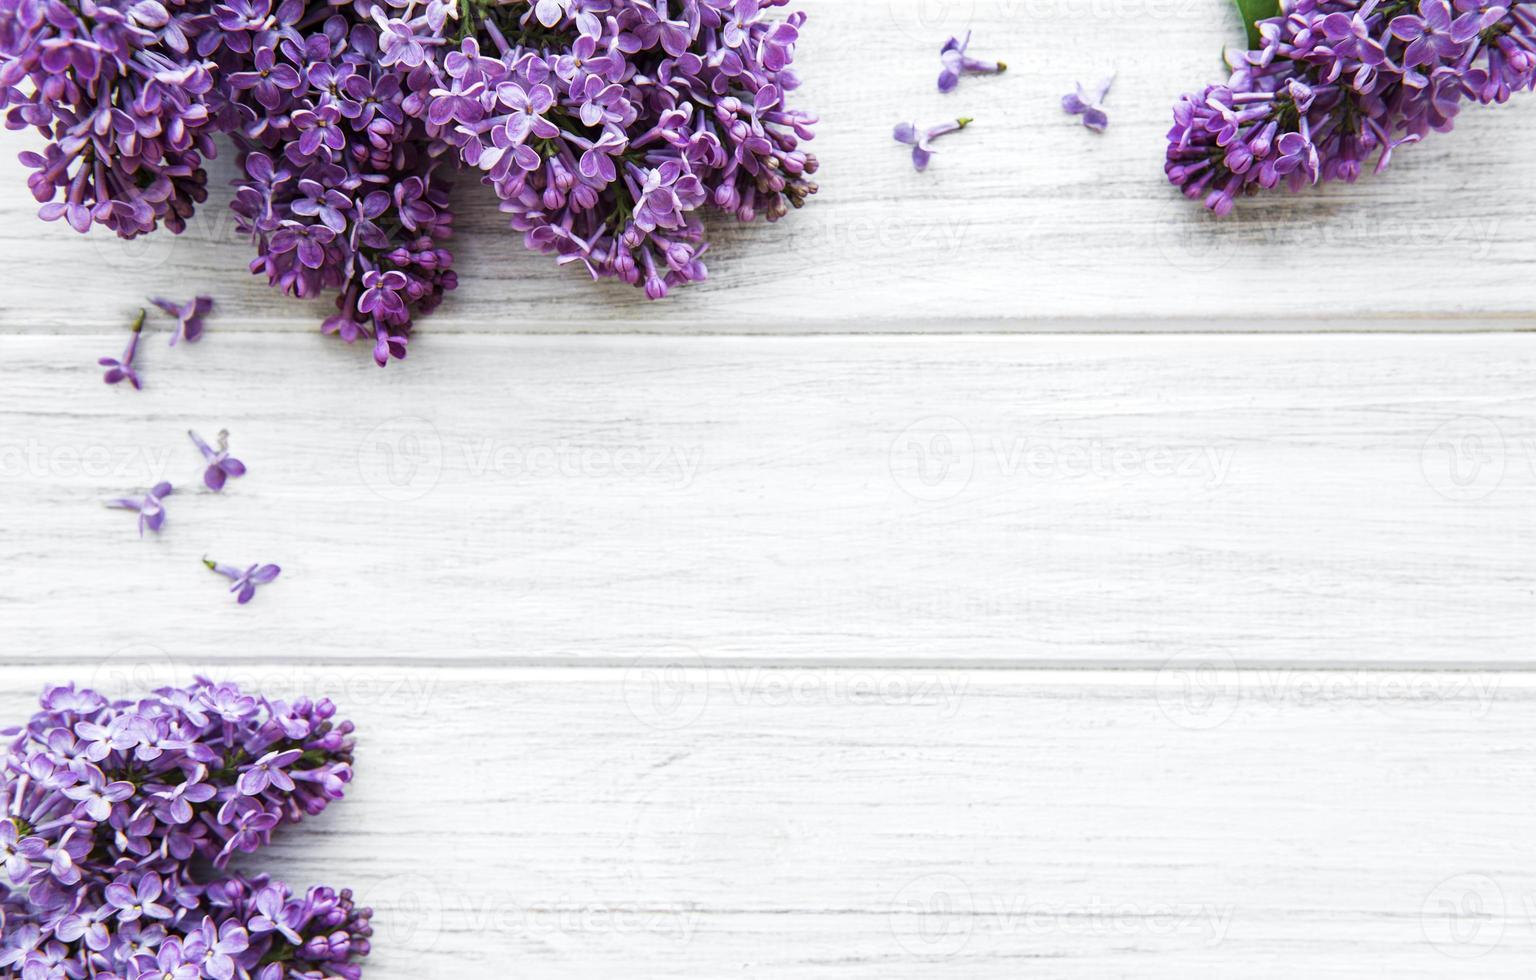 Flores de color lila sobre un fondo de madera blanca foto